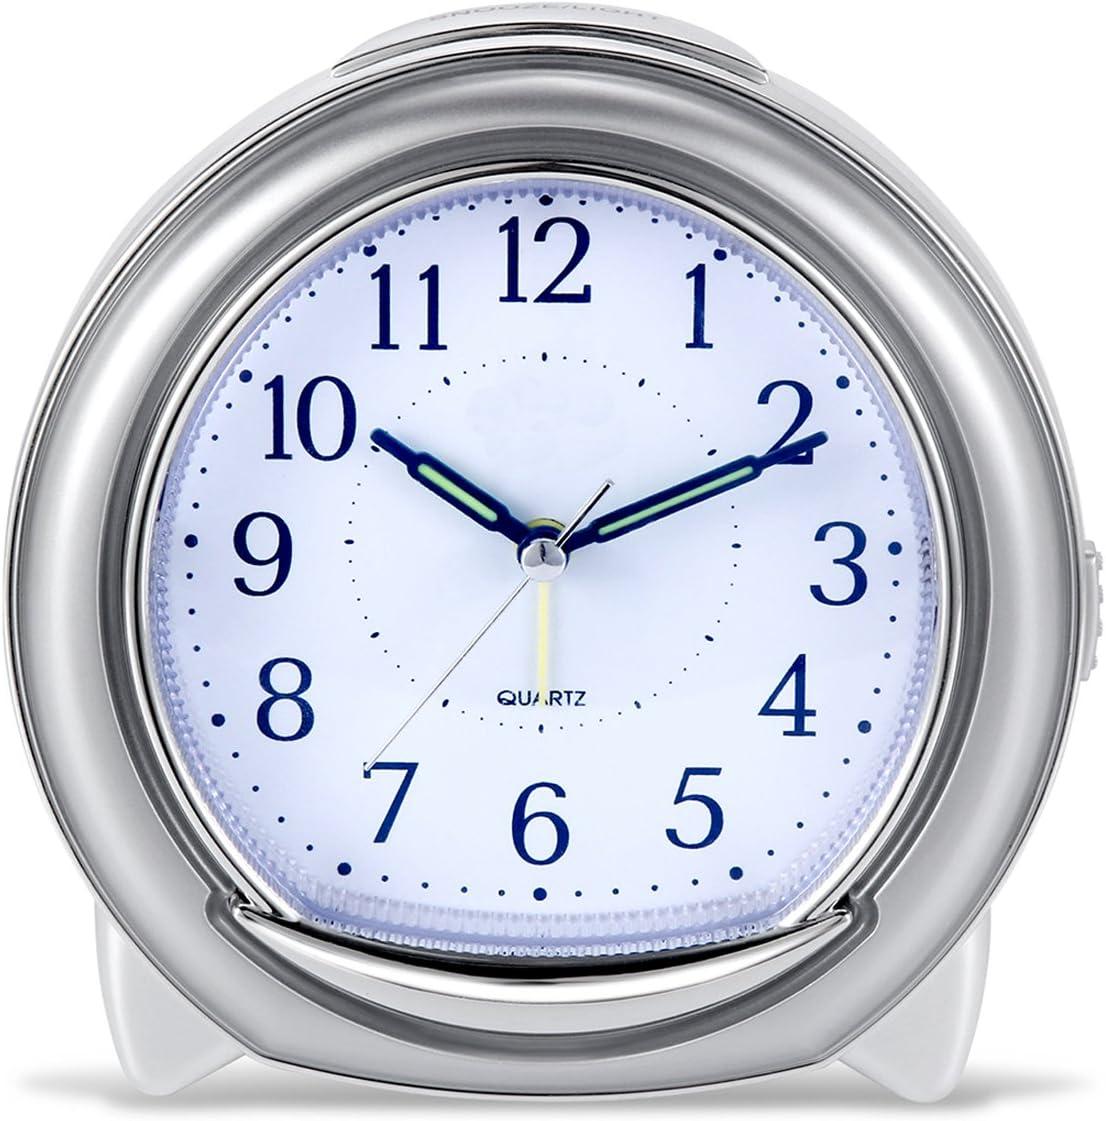 BonyTek Desk Alarm Clock, Silent Quartz Alarm Clock with Loud Mechanical Bell Bird Song Melody Alarm, Nightlight, Snooze, Silent Sweep Seconds, Luminous Hands, Battery Powered (Sliver)